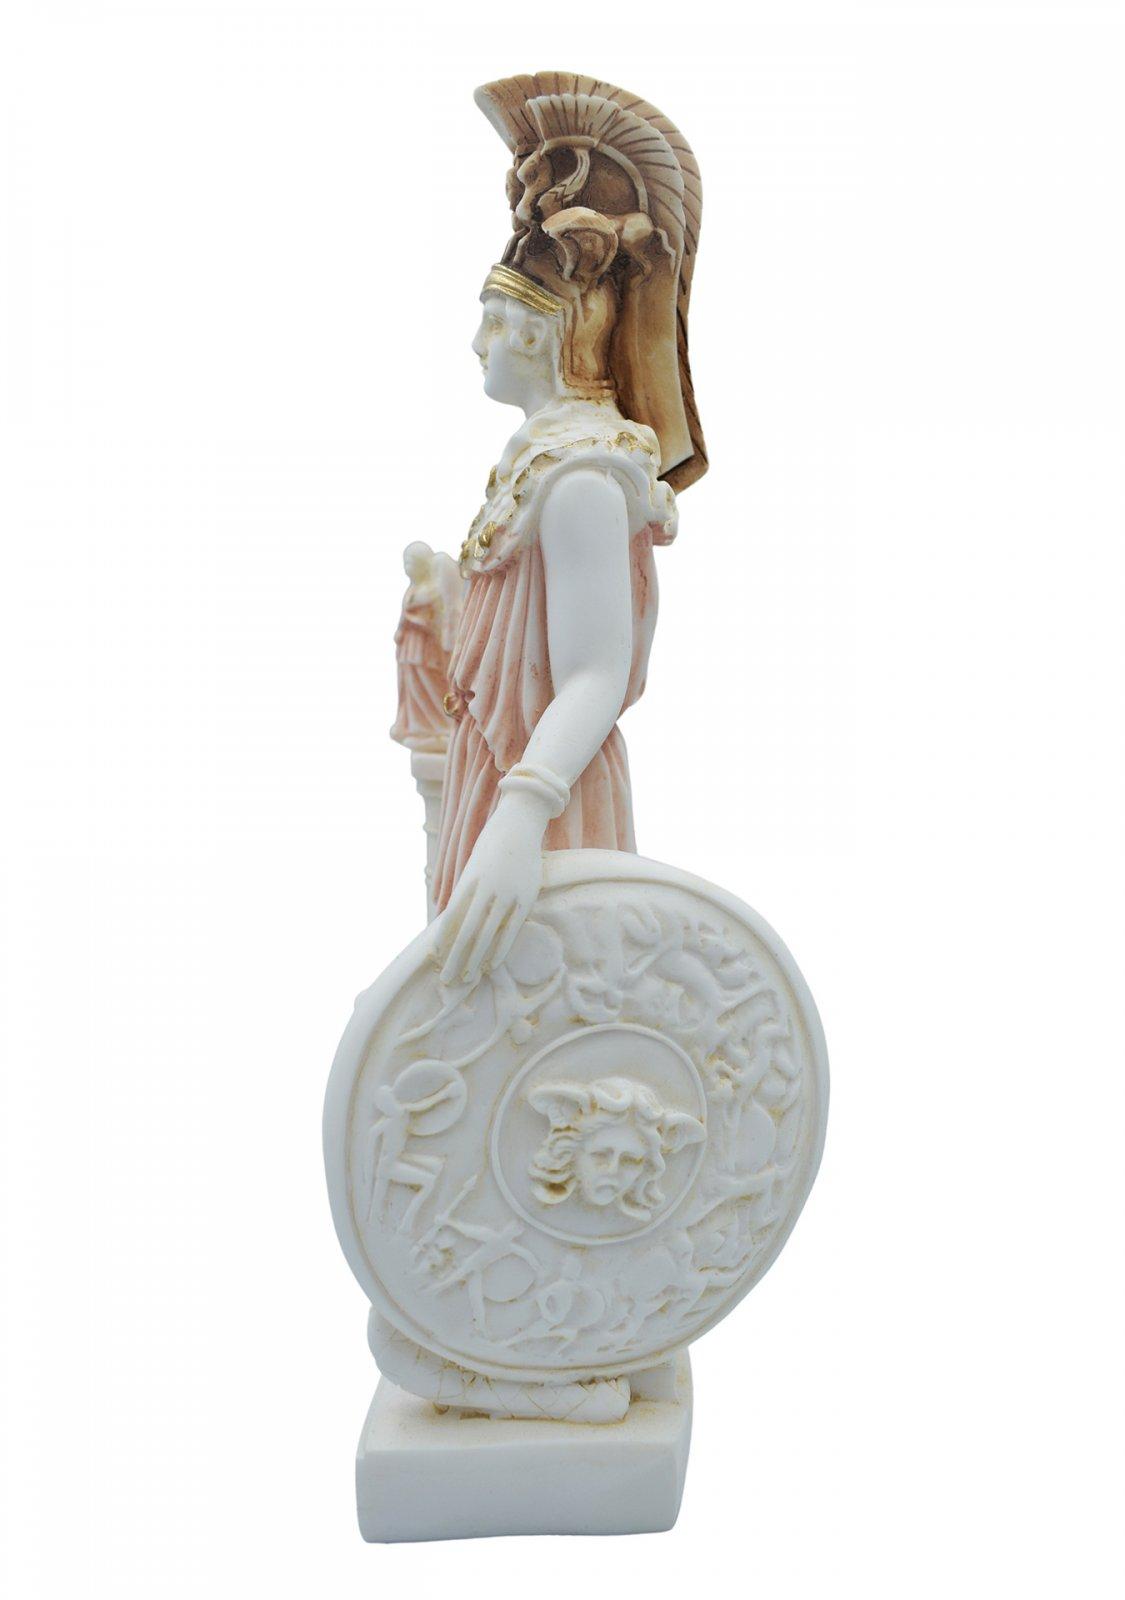 Athena Pallas, Greek goddess of wisdom, alabaster statue with color